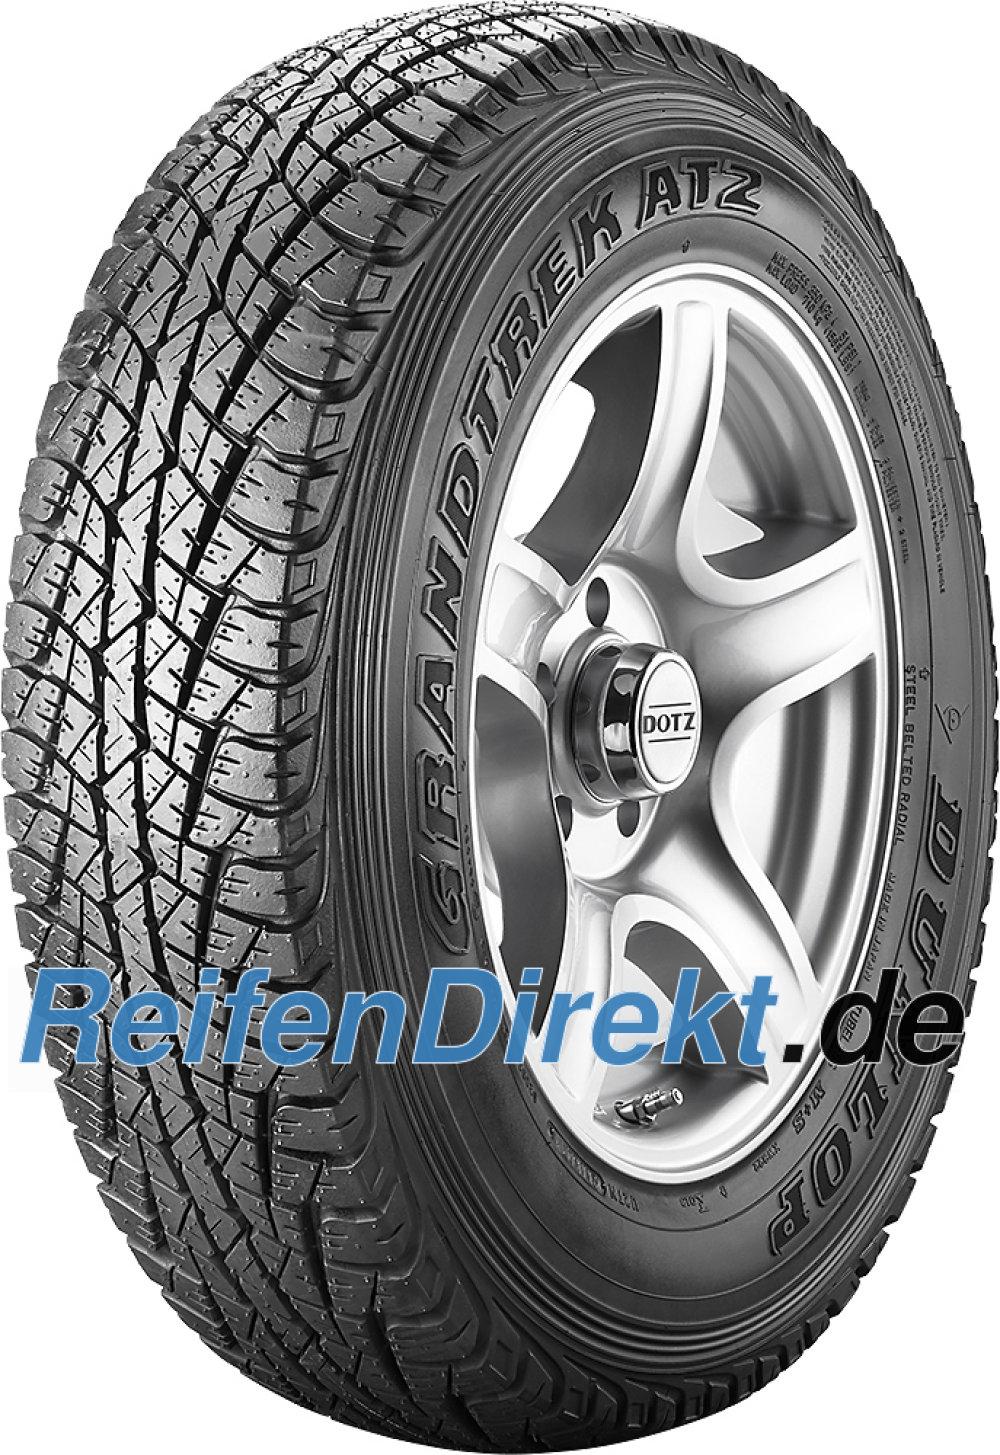 Dunlop Grandtrek AT 2 ( 195/80 R15 96S RBL )